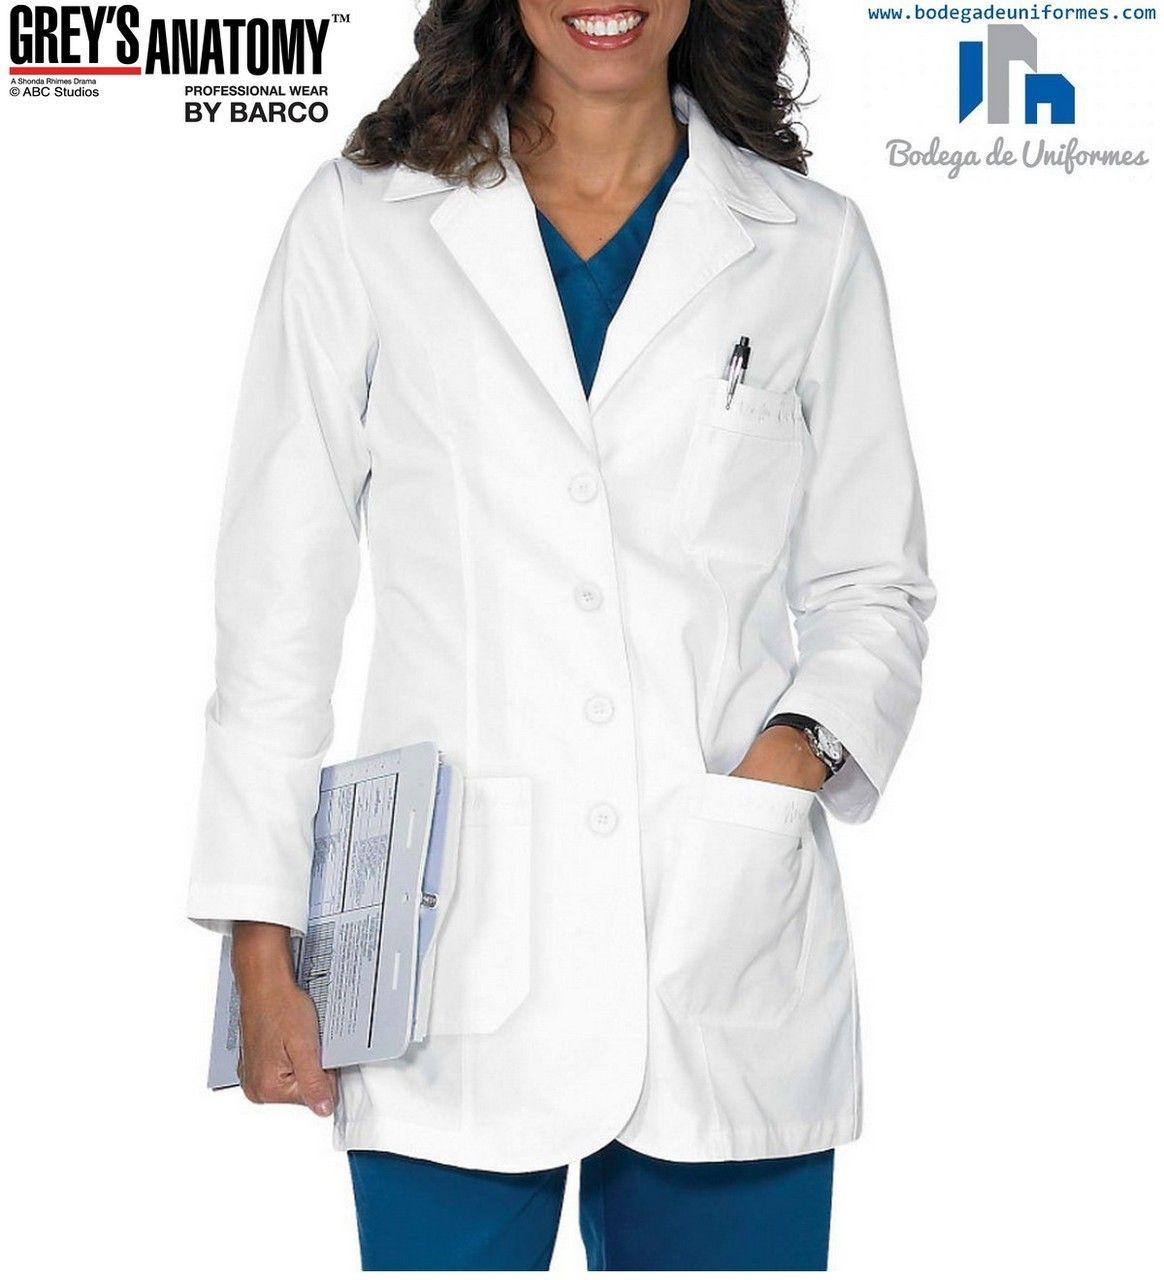 Grey\'s Anatomy by Barco 4425-10 Bata Medica | Salud | Pinterest ...